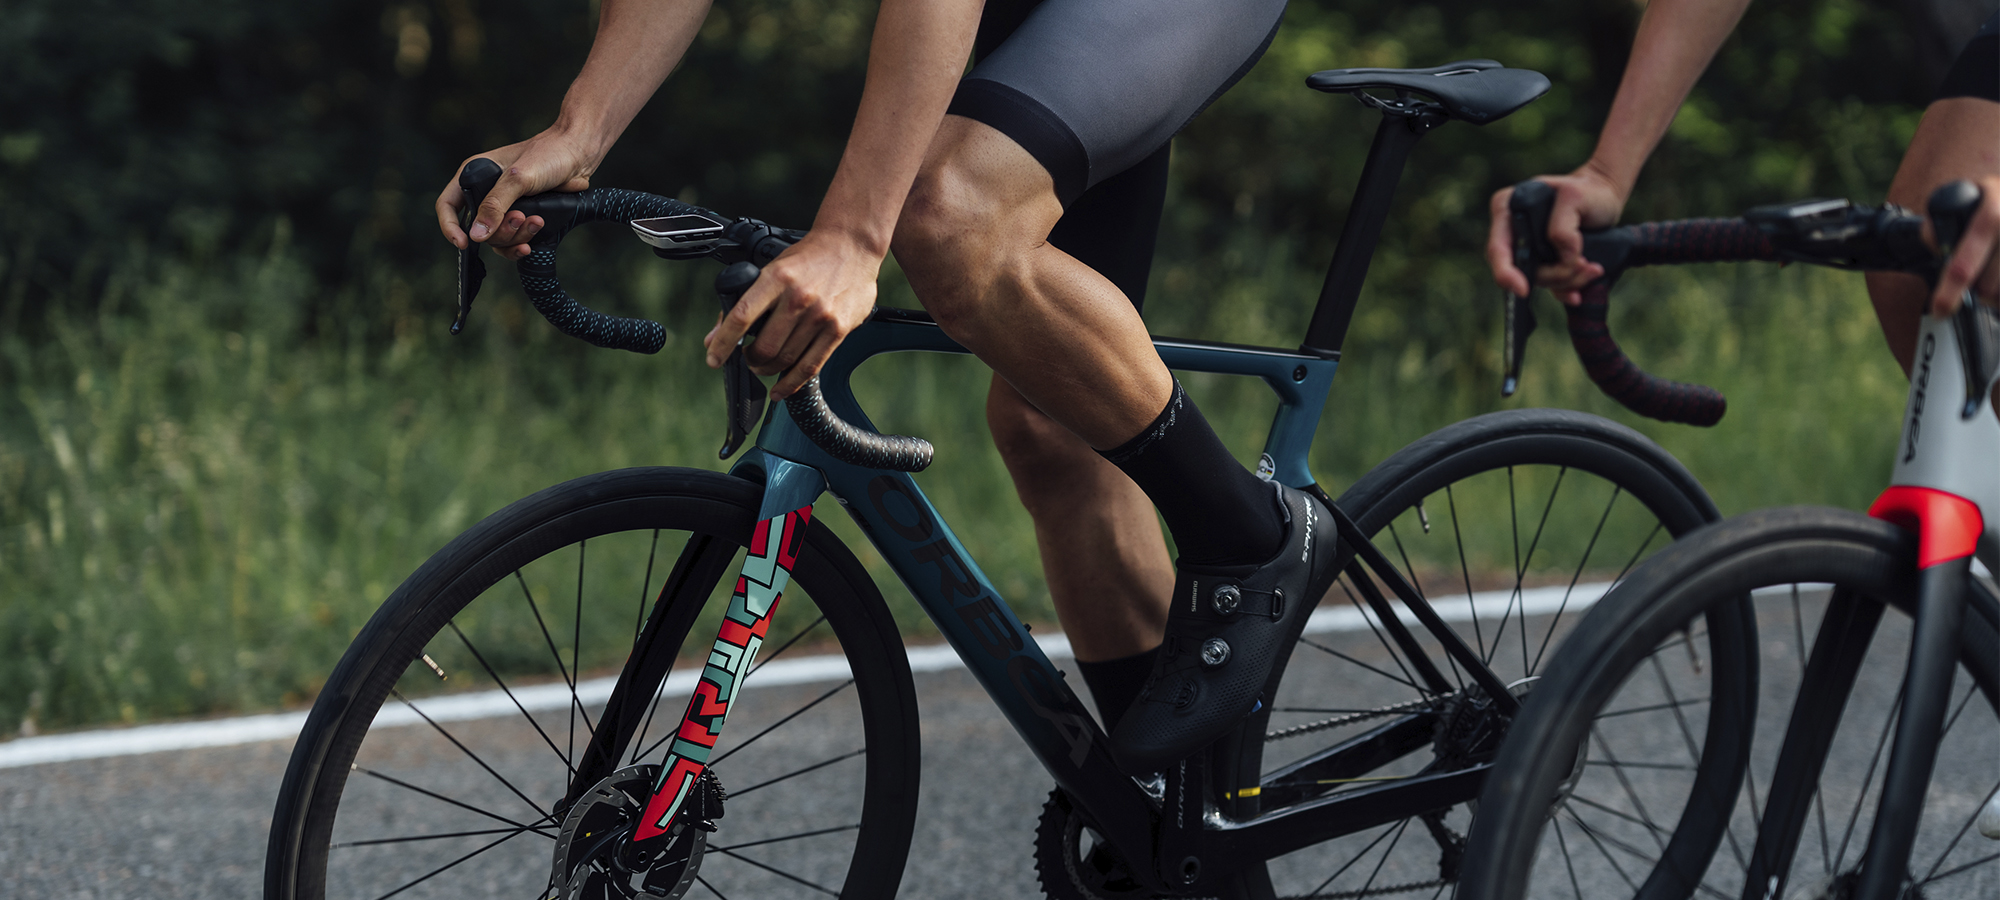 DOT_diseño_producto_OrcaOMX_Bicicleta_Carretera_Bicycles_Road_Ciclismo_Orbea_7 (1)